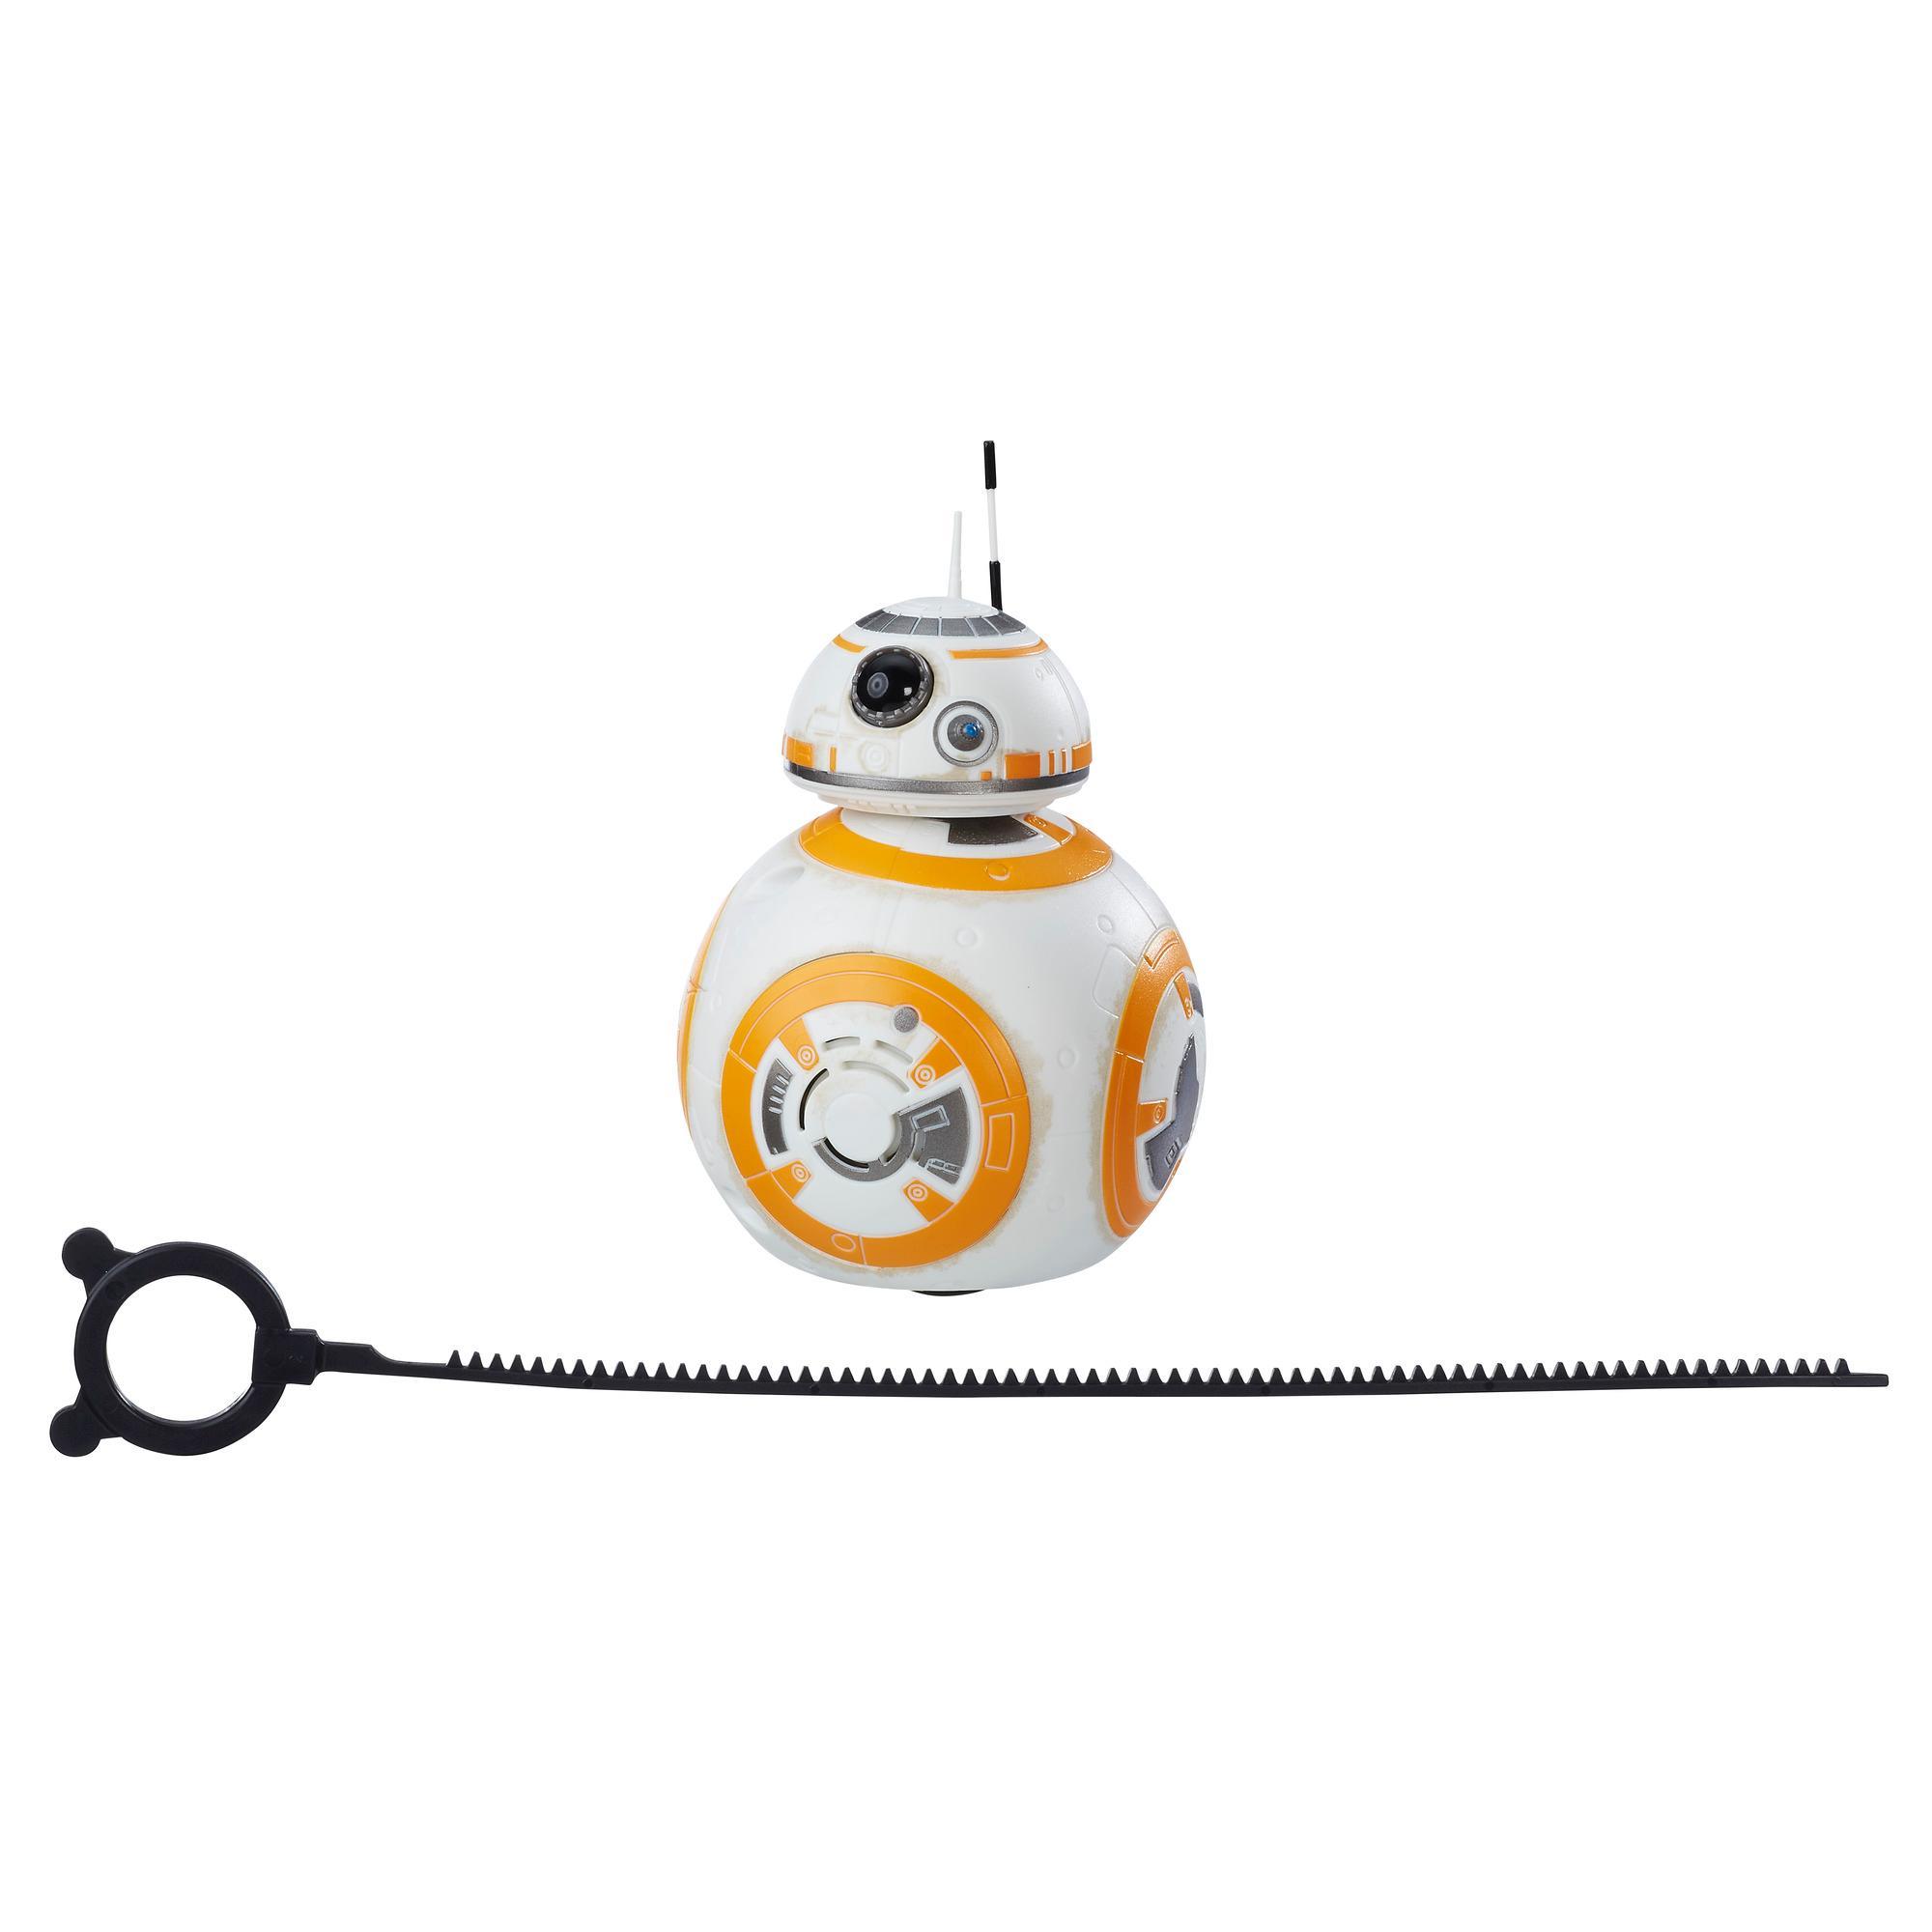 Star Wars - BB-8 Propulsion